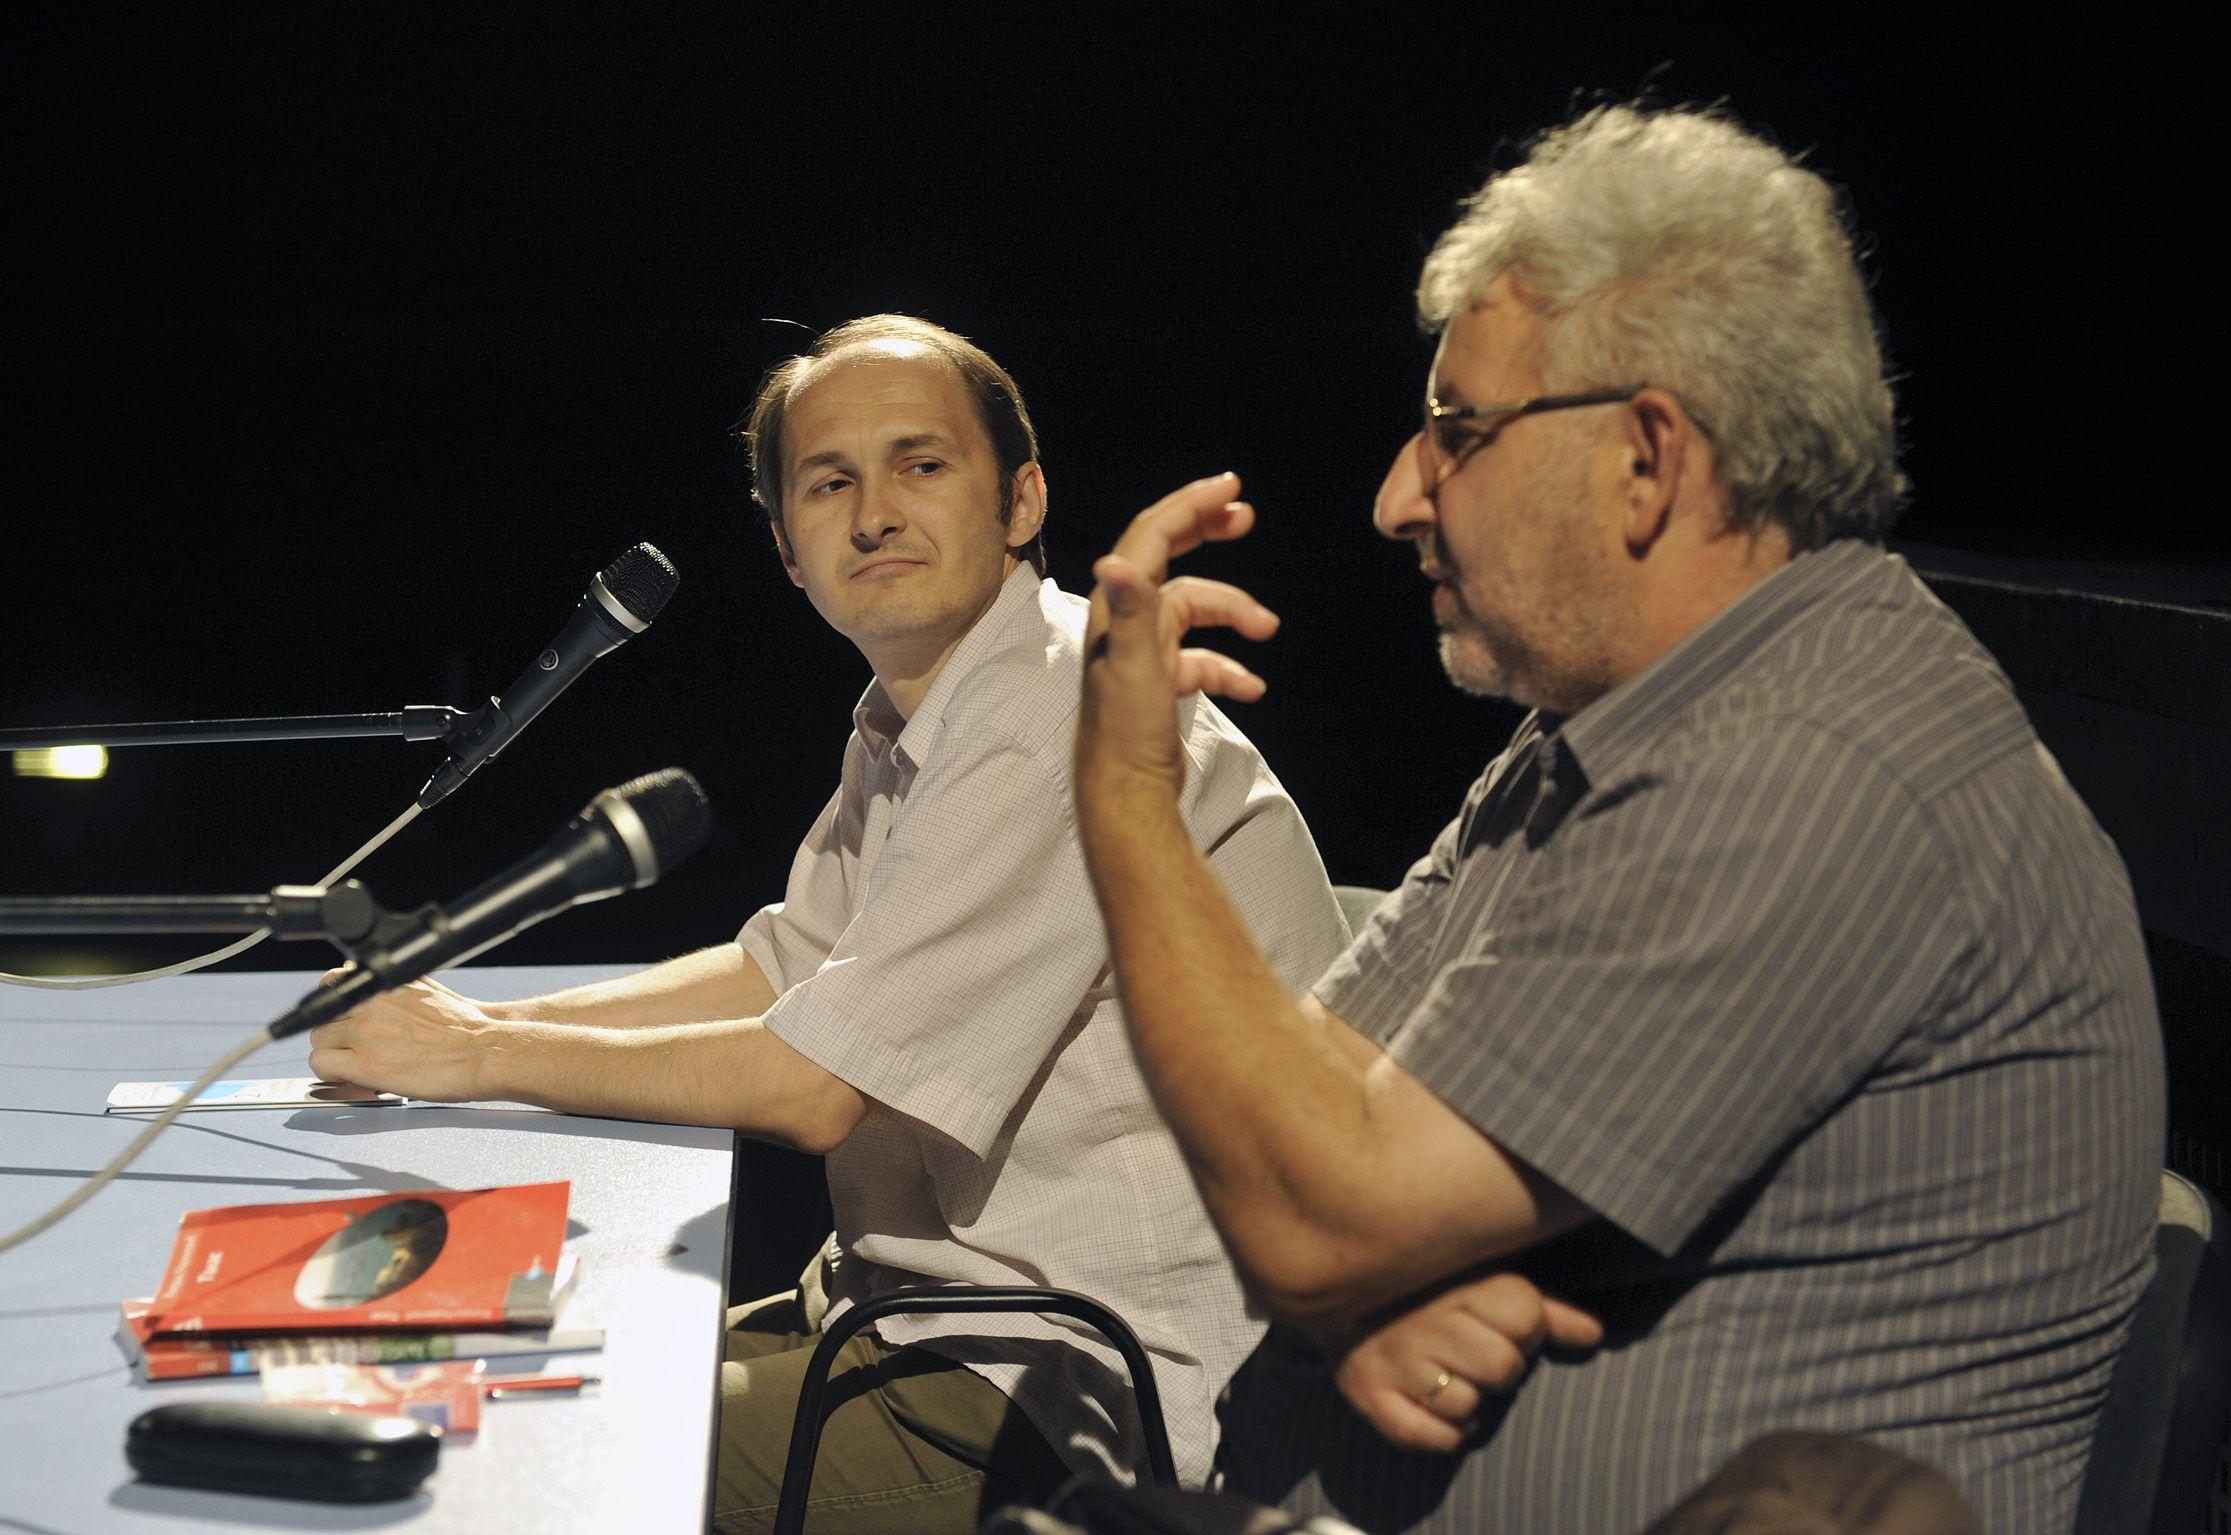 Arhipelag_Živorad Needeljković na Beogradskom festivalu evropske književnosti